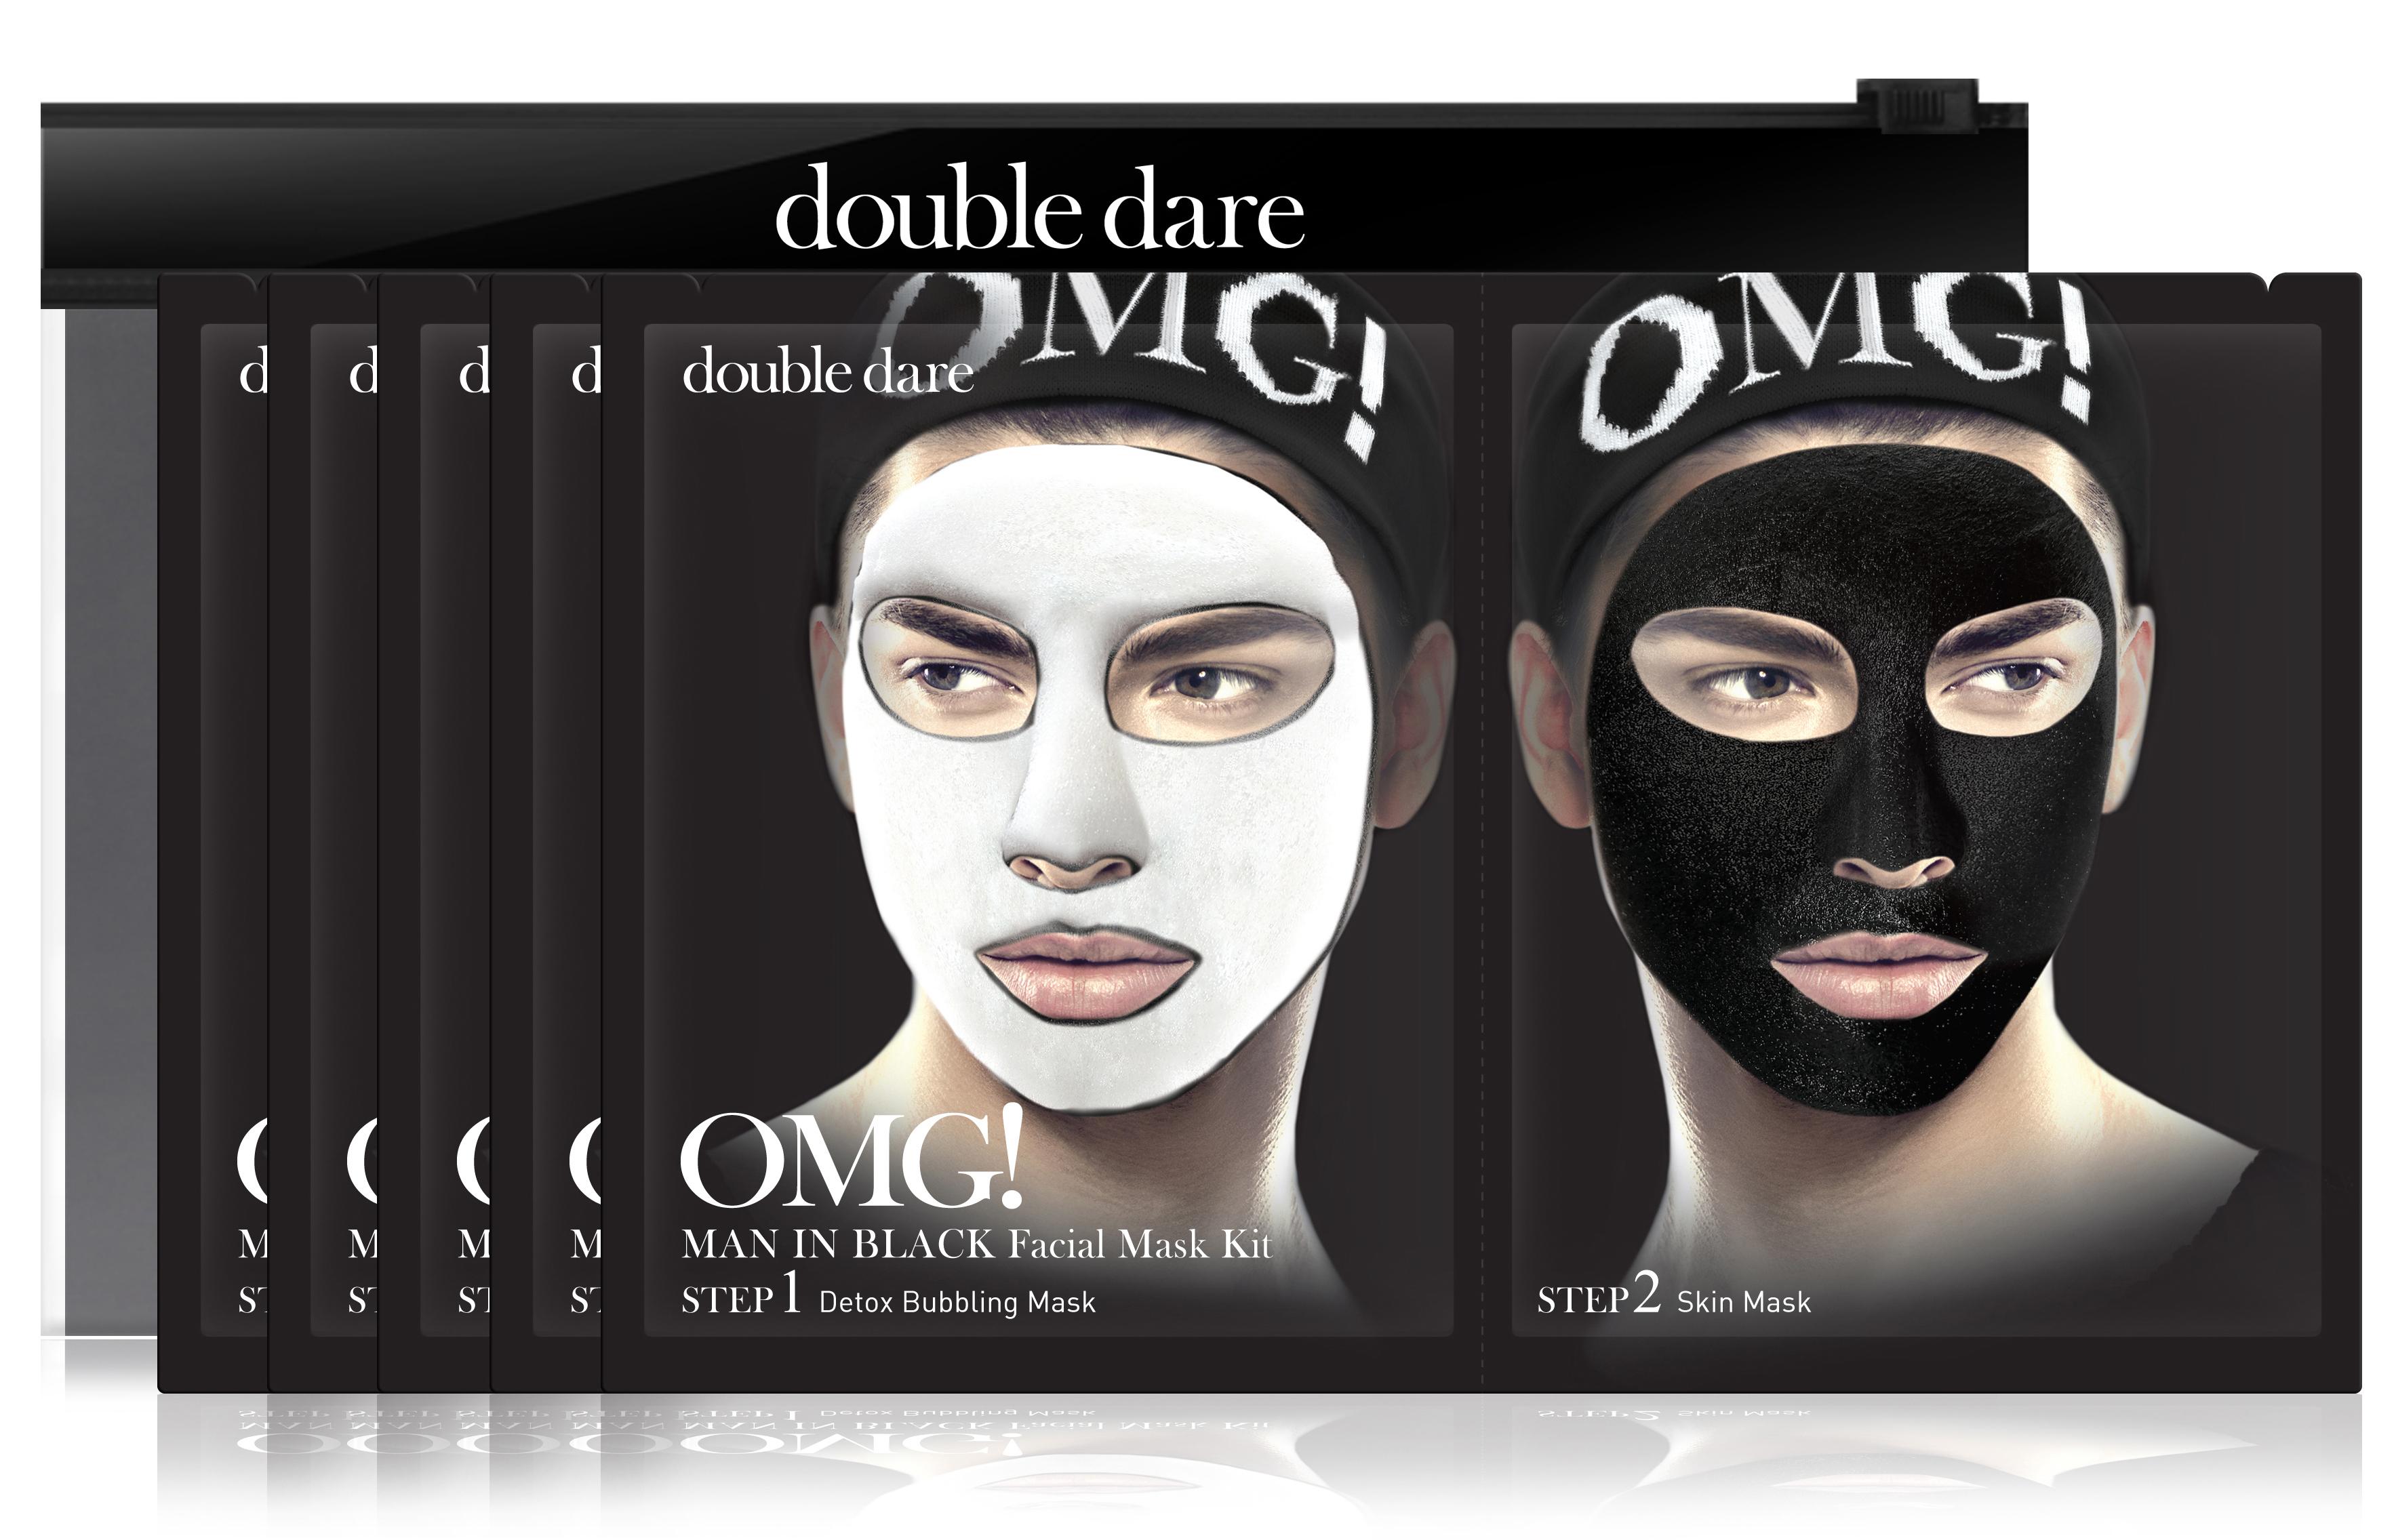 DOUBLE DARE OMG! Комплекс мужских масок двухкомпонентный Детокс / Man in Black 5 шт фото